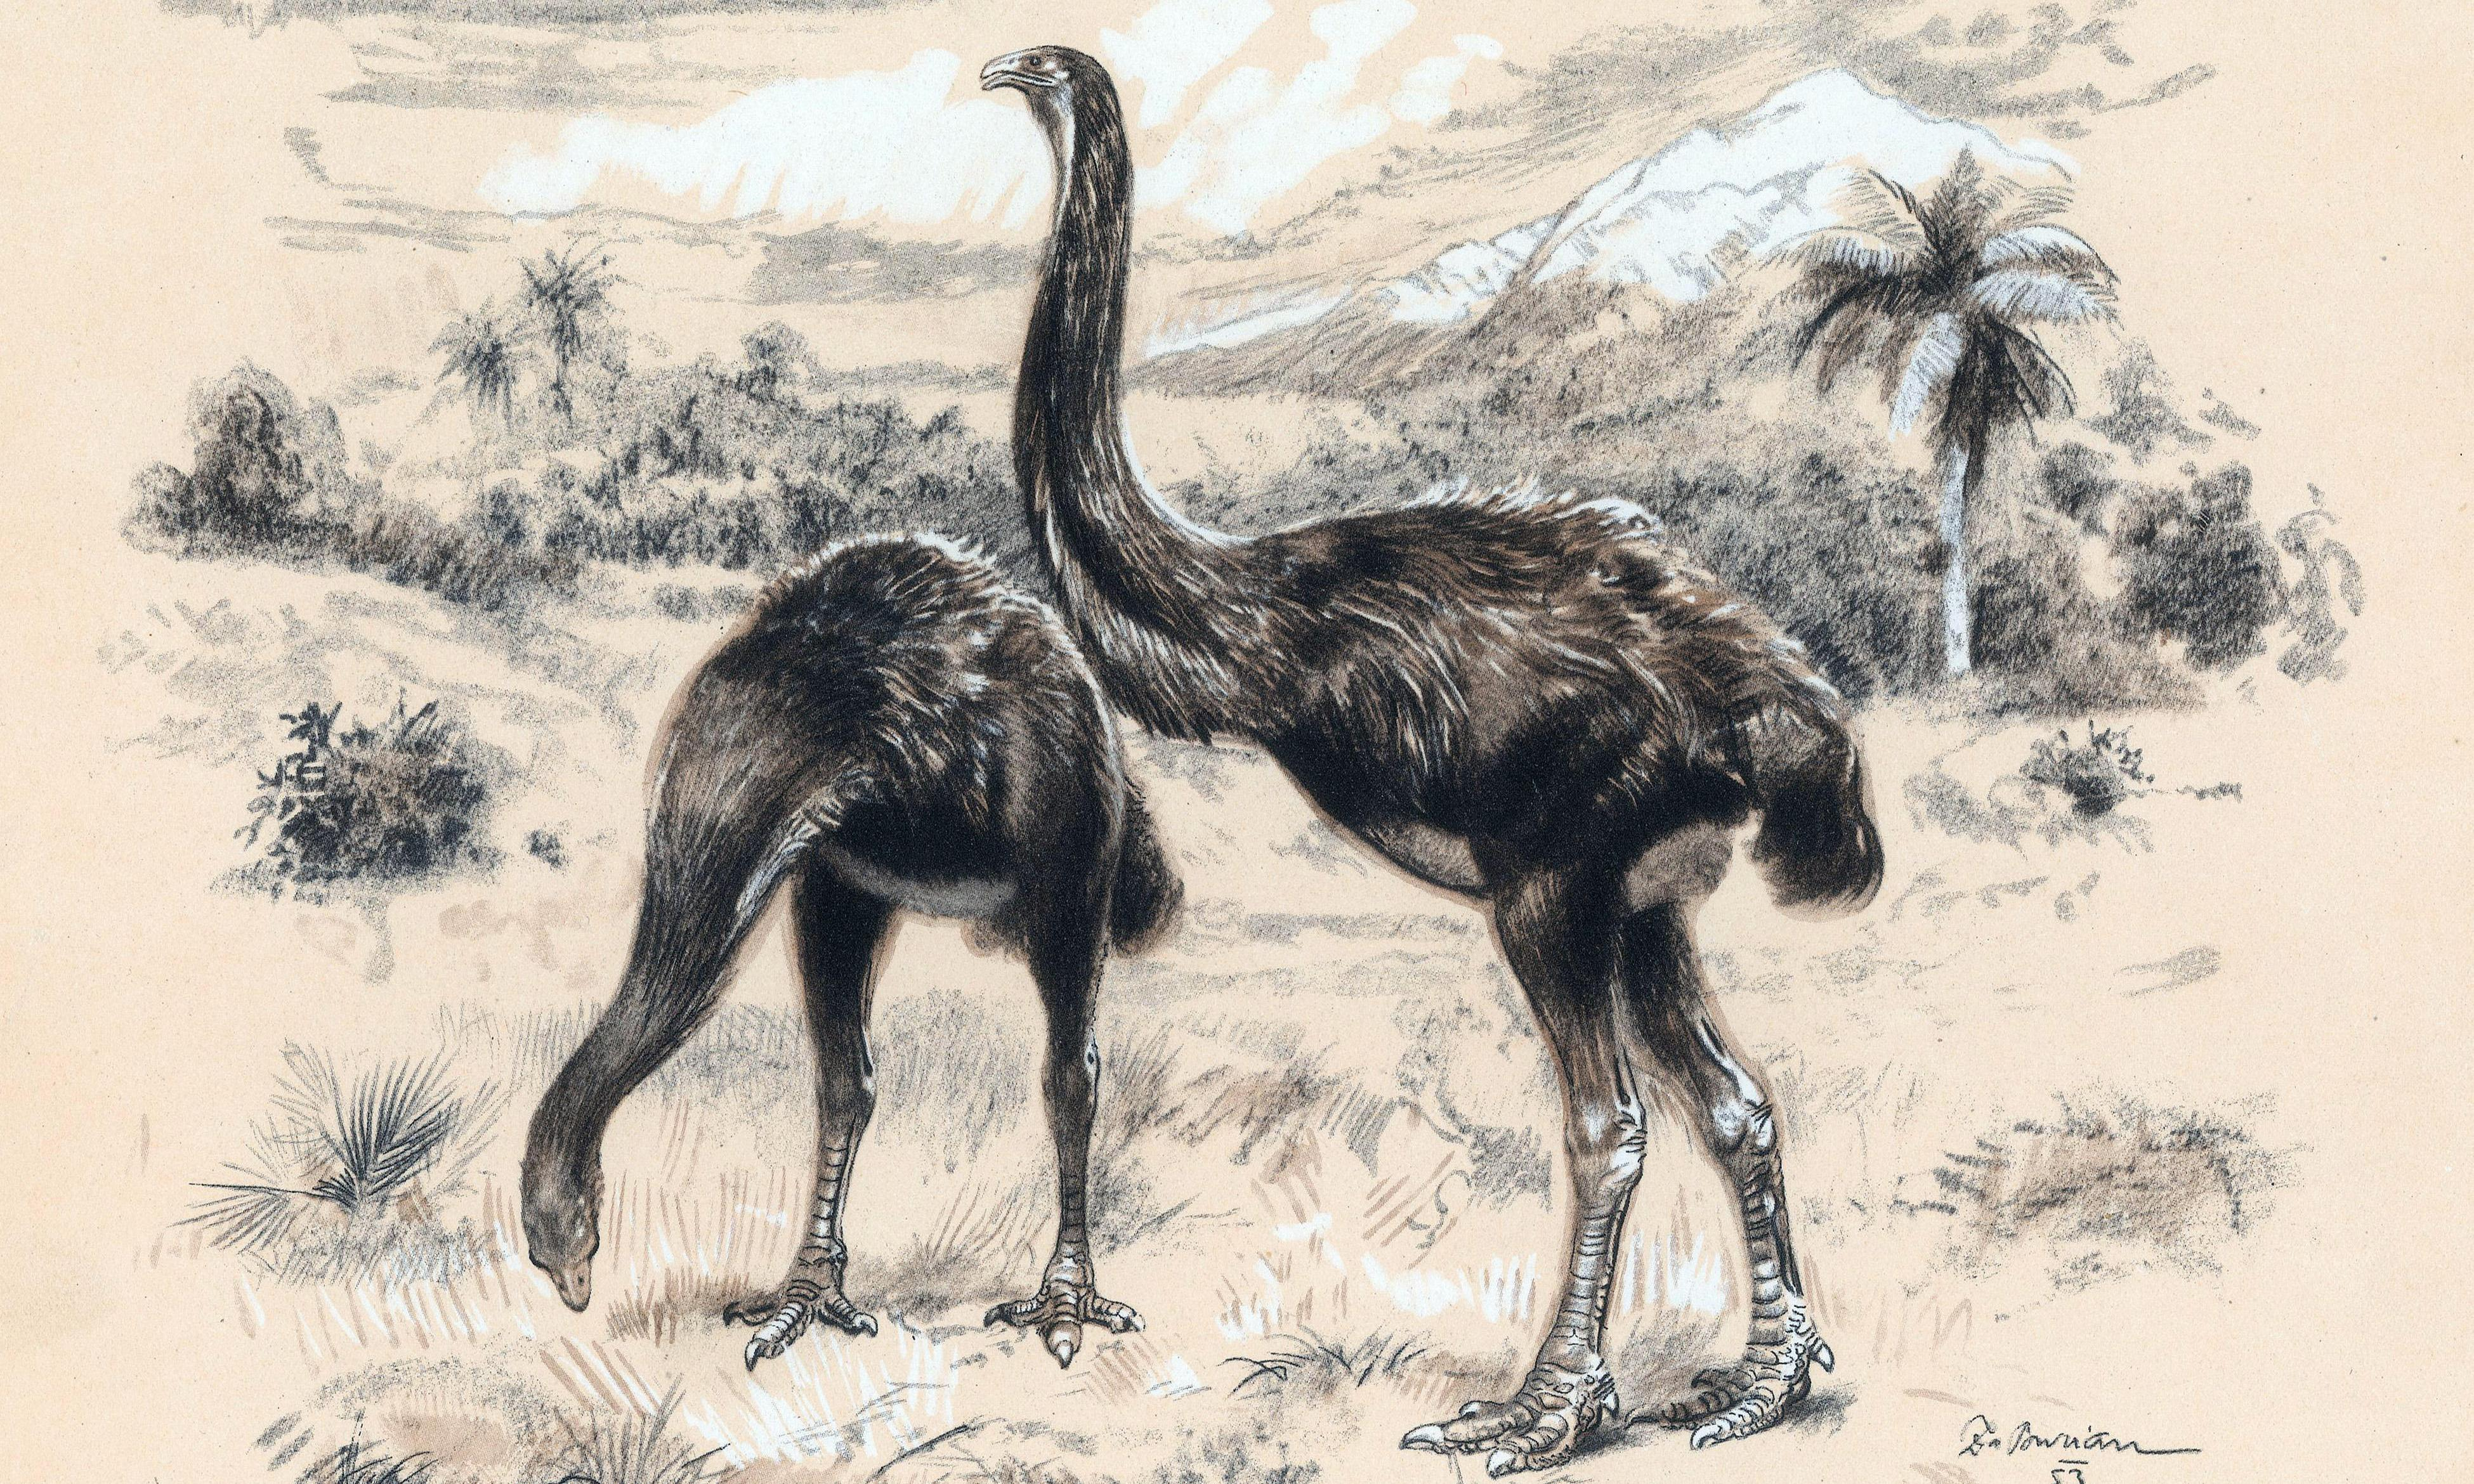 Moa for sale: trade in extinct birds' bones threatens New Zealand's history